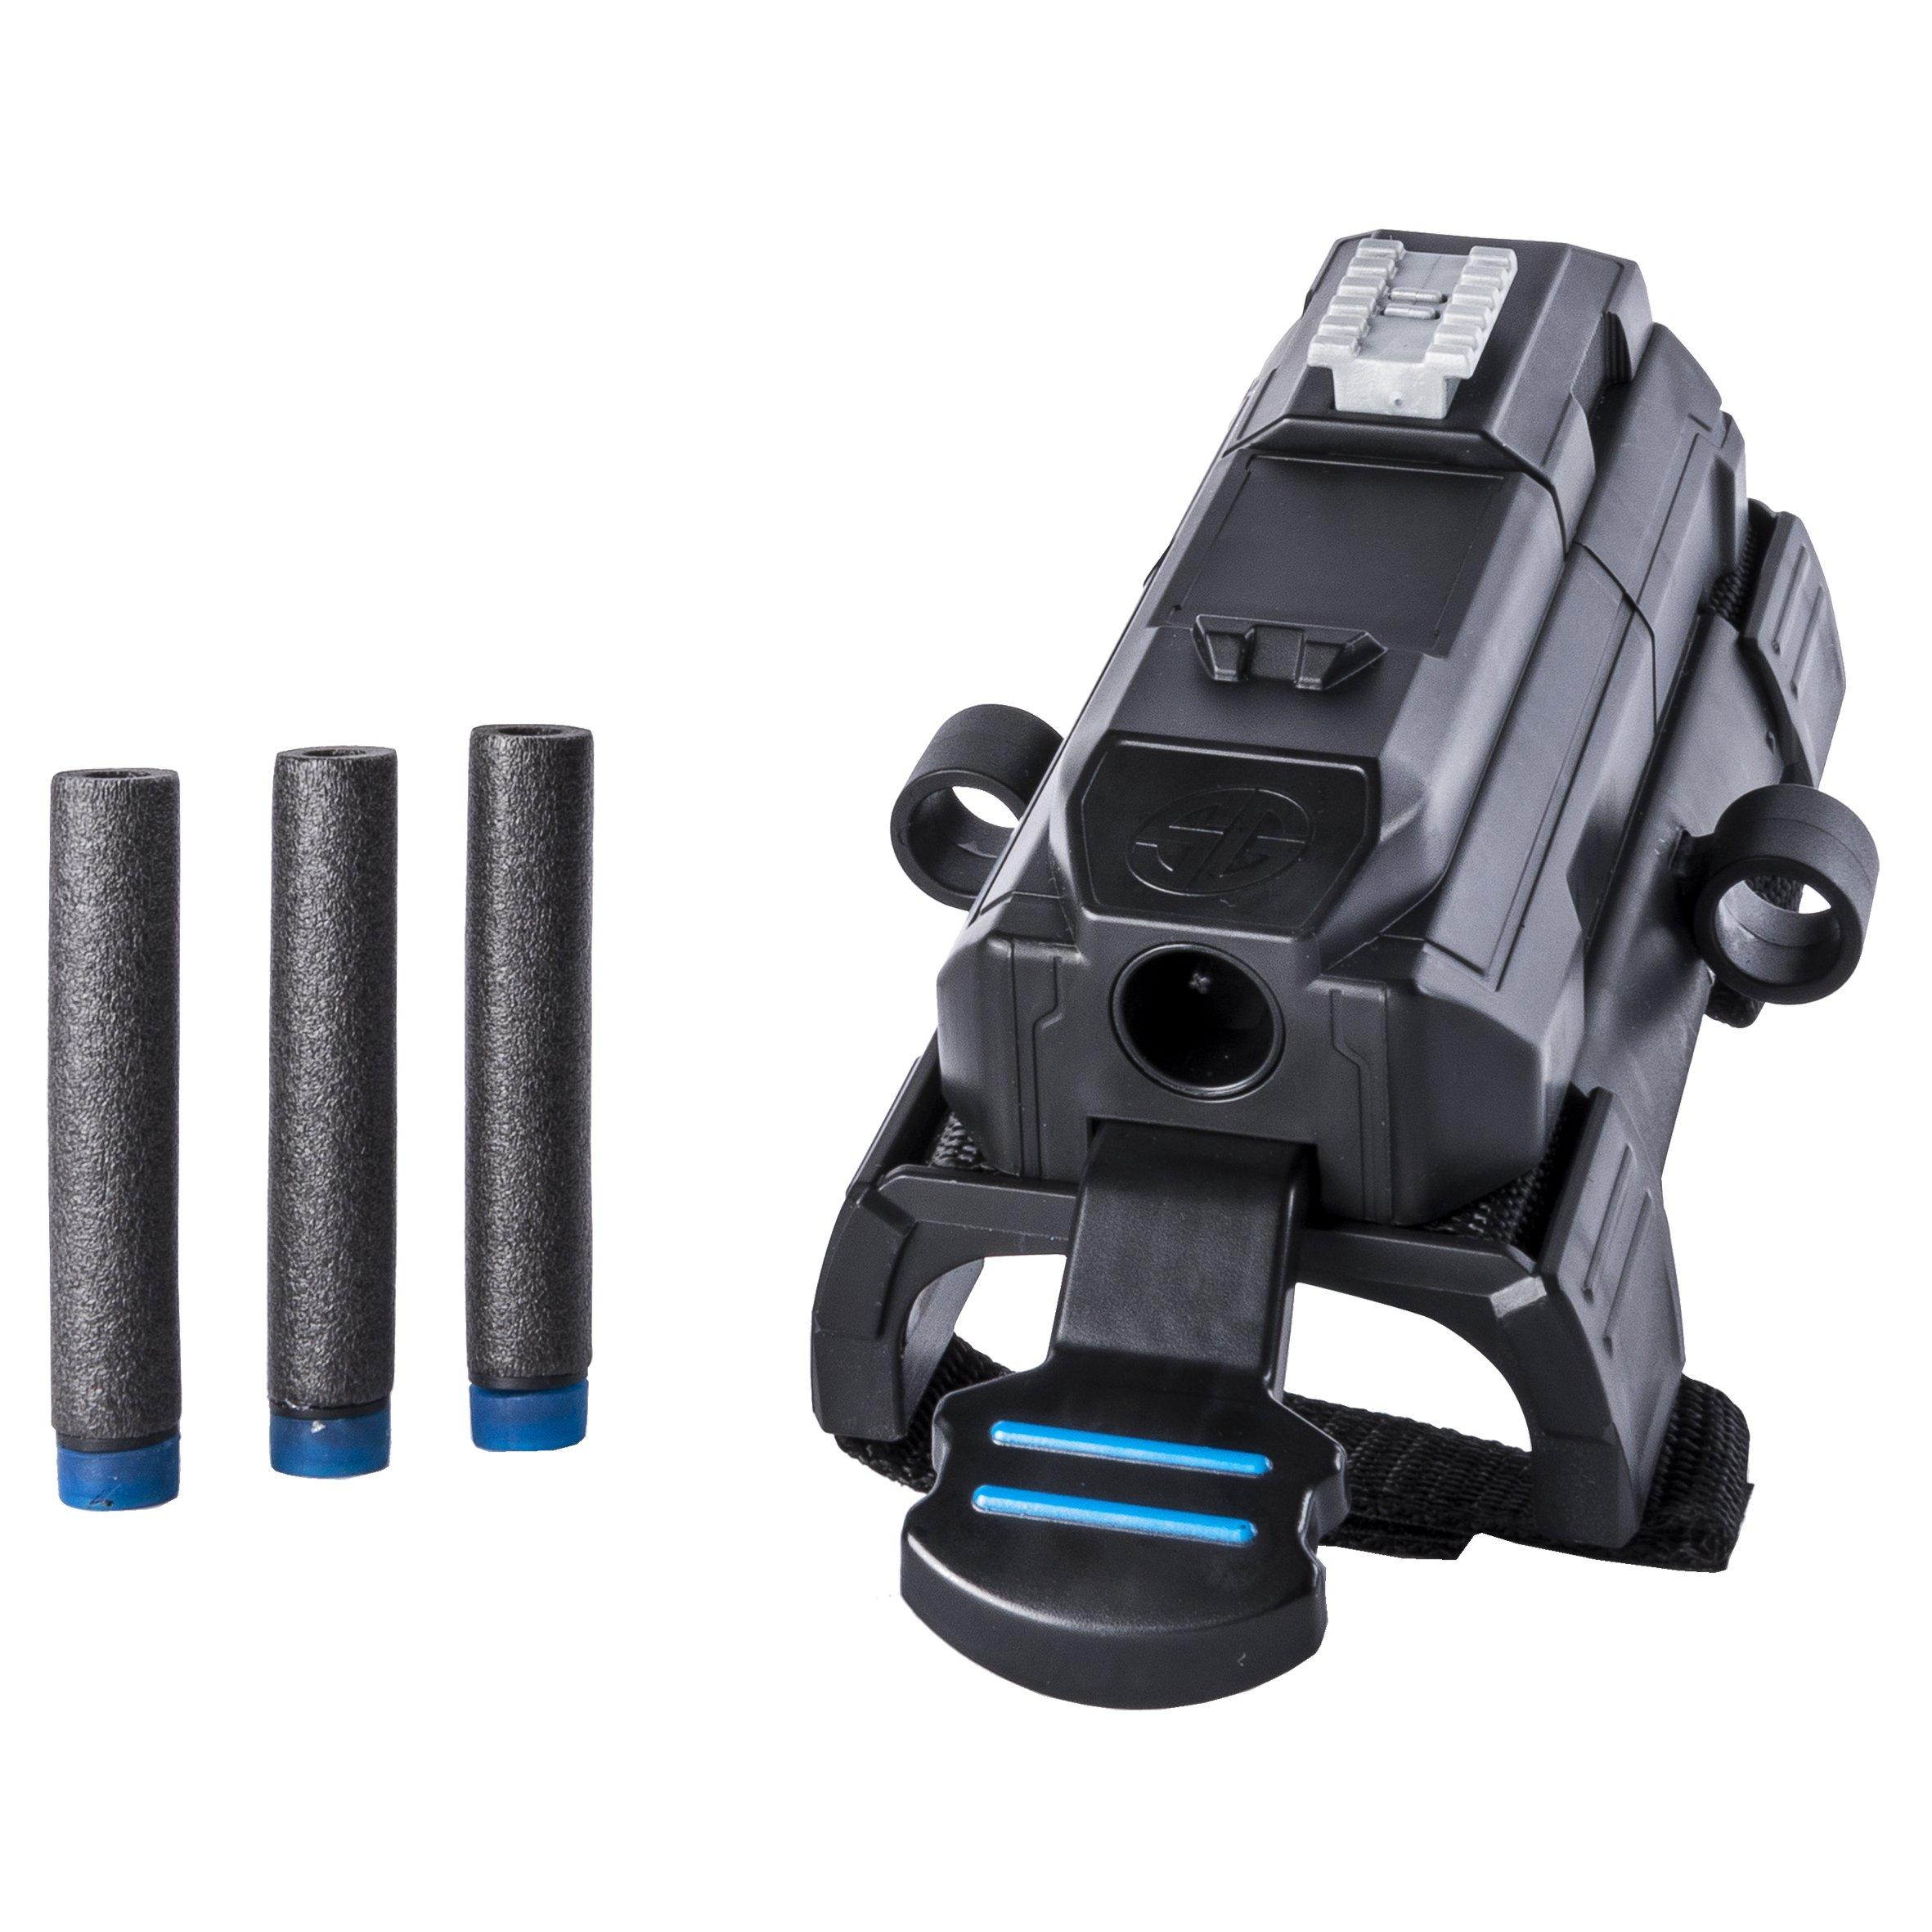 Spy Gear 6033009 Ninja Wrist Blaster by Spy Gear (Image #3)